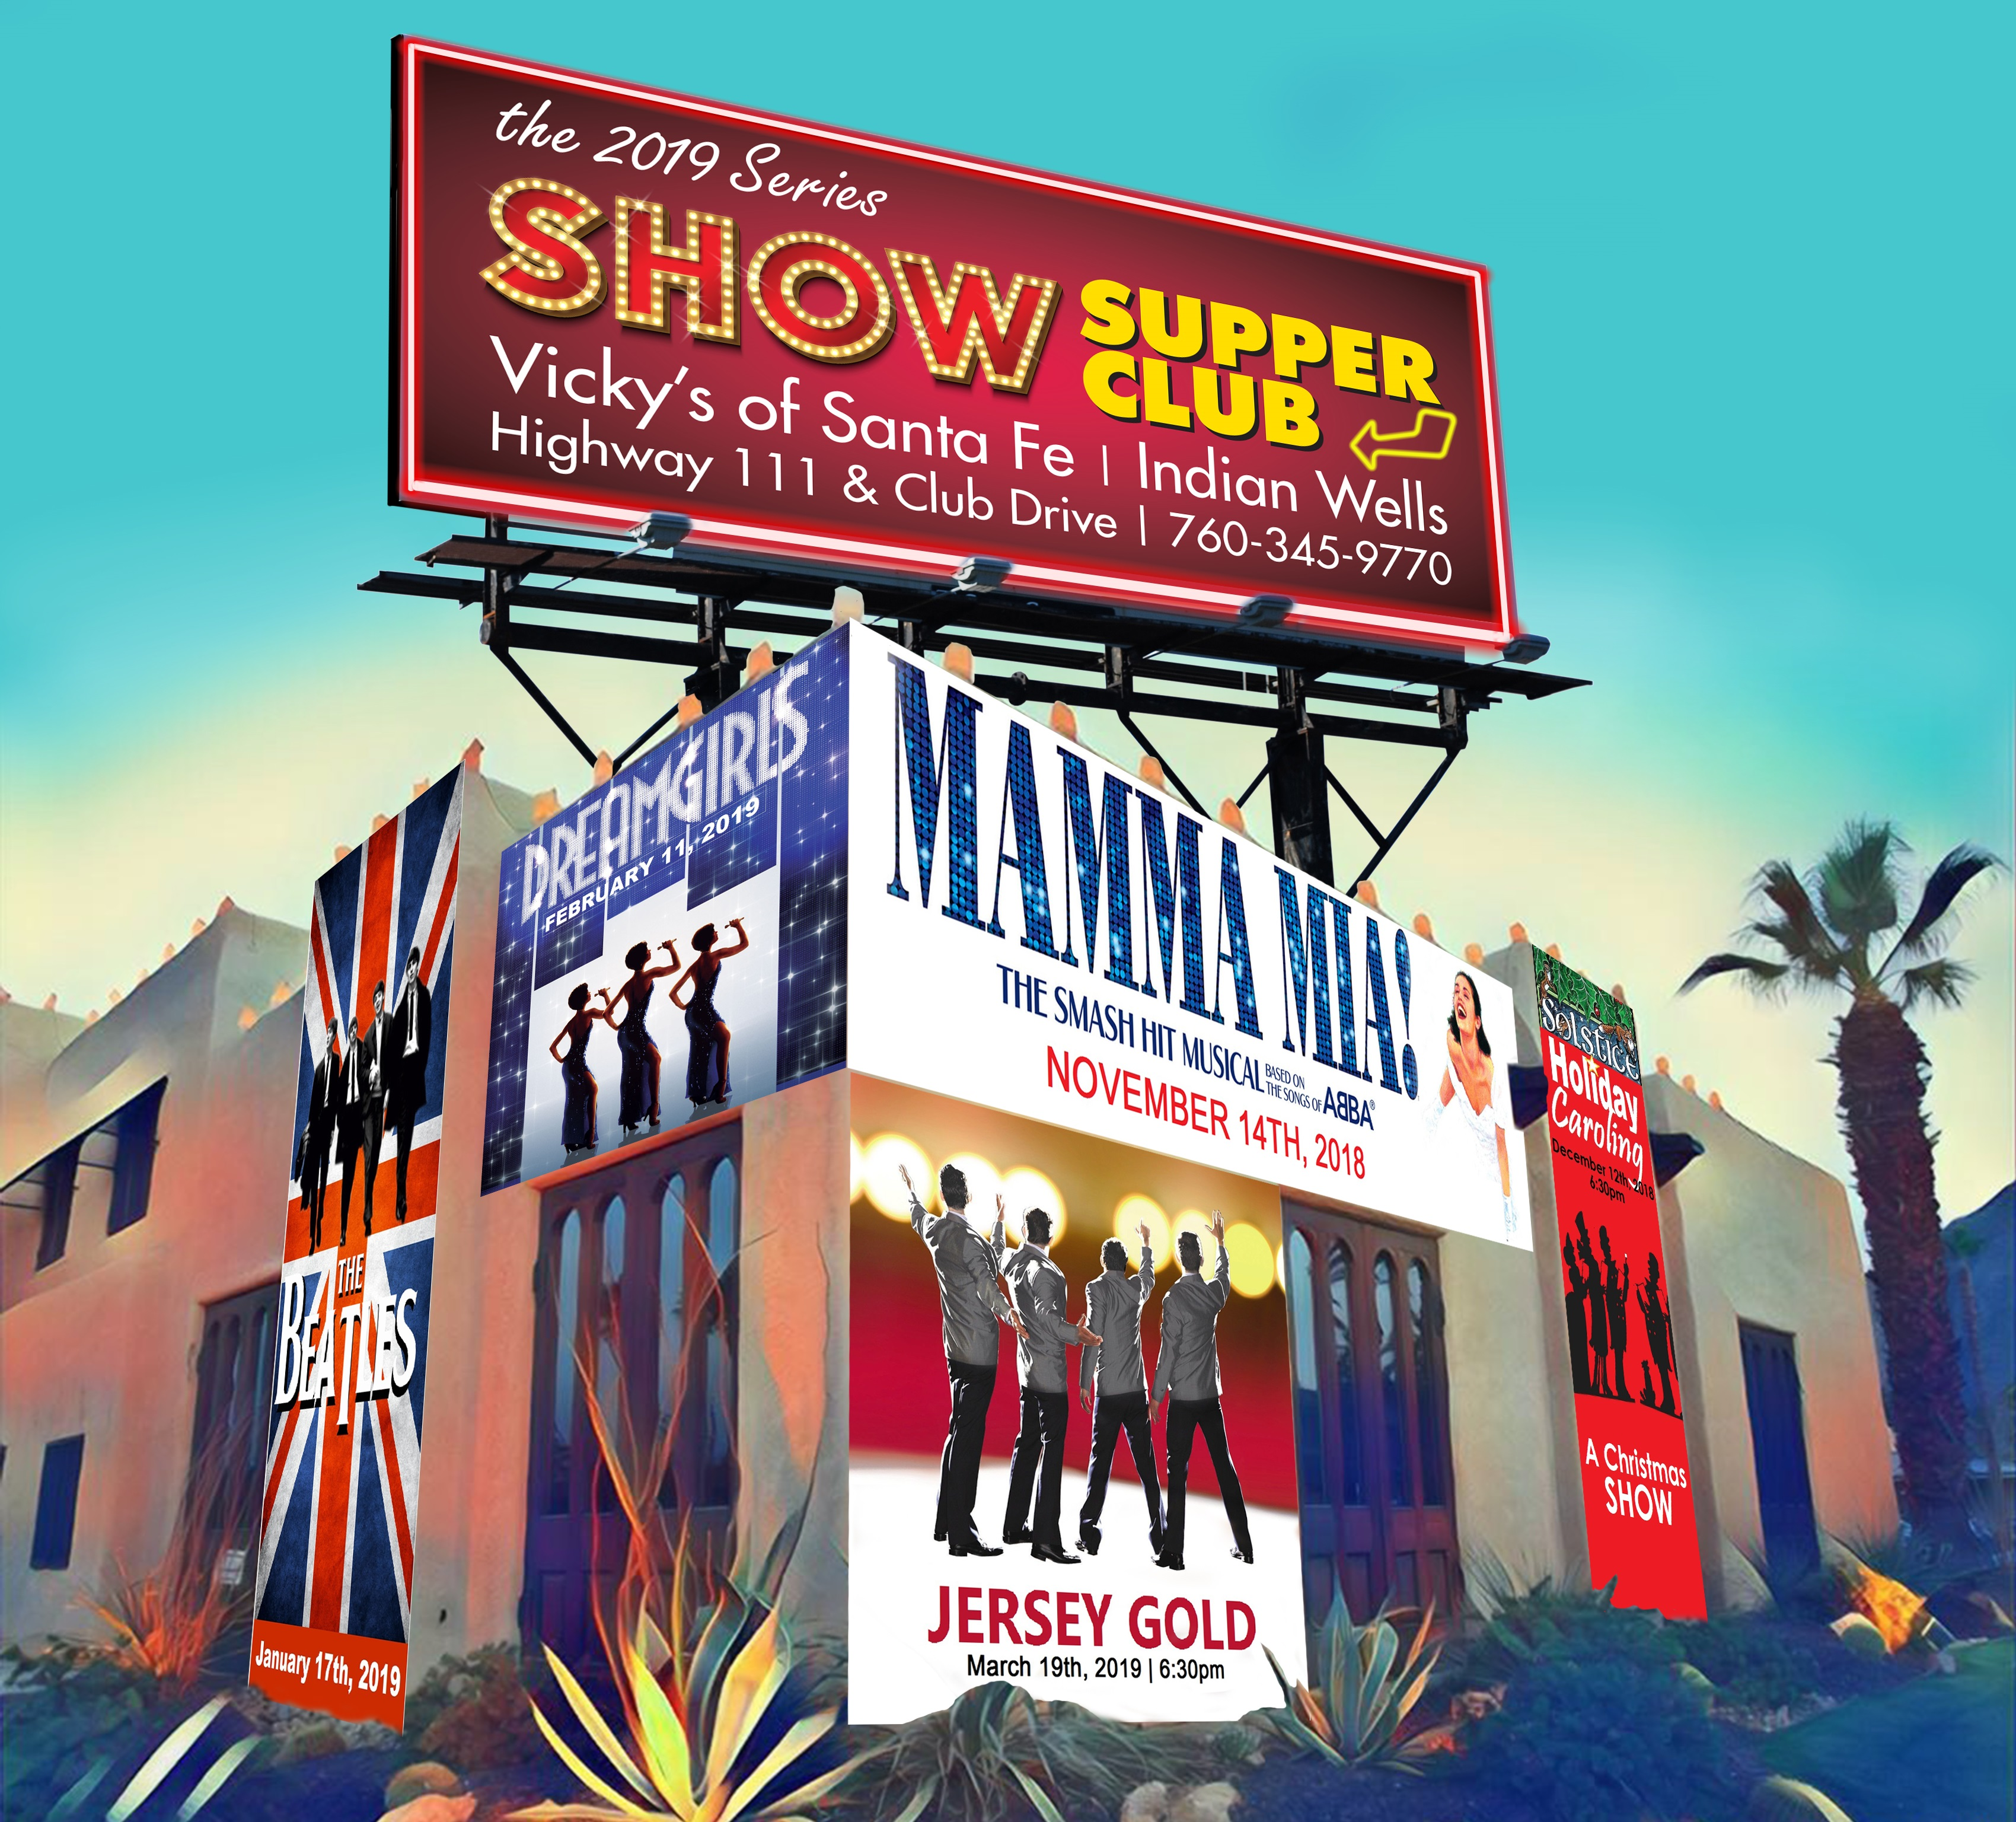 Show Supper Club advertisement